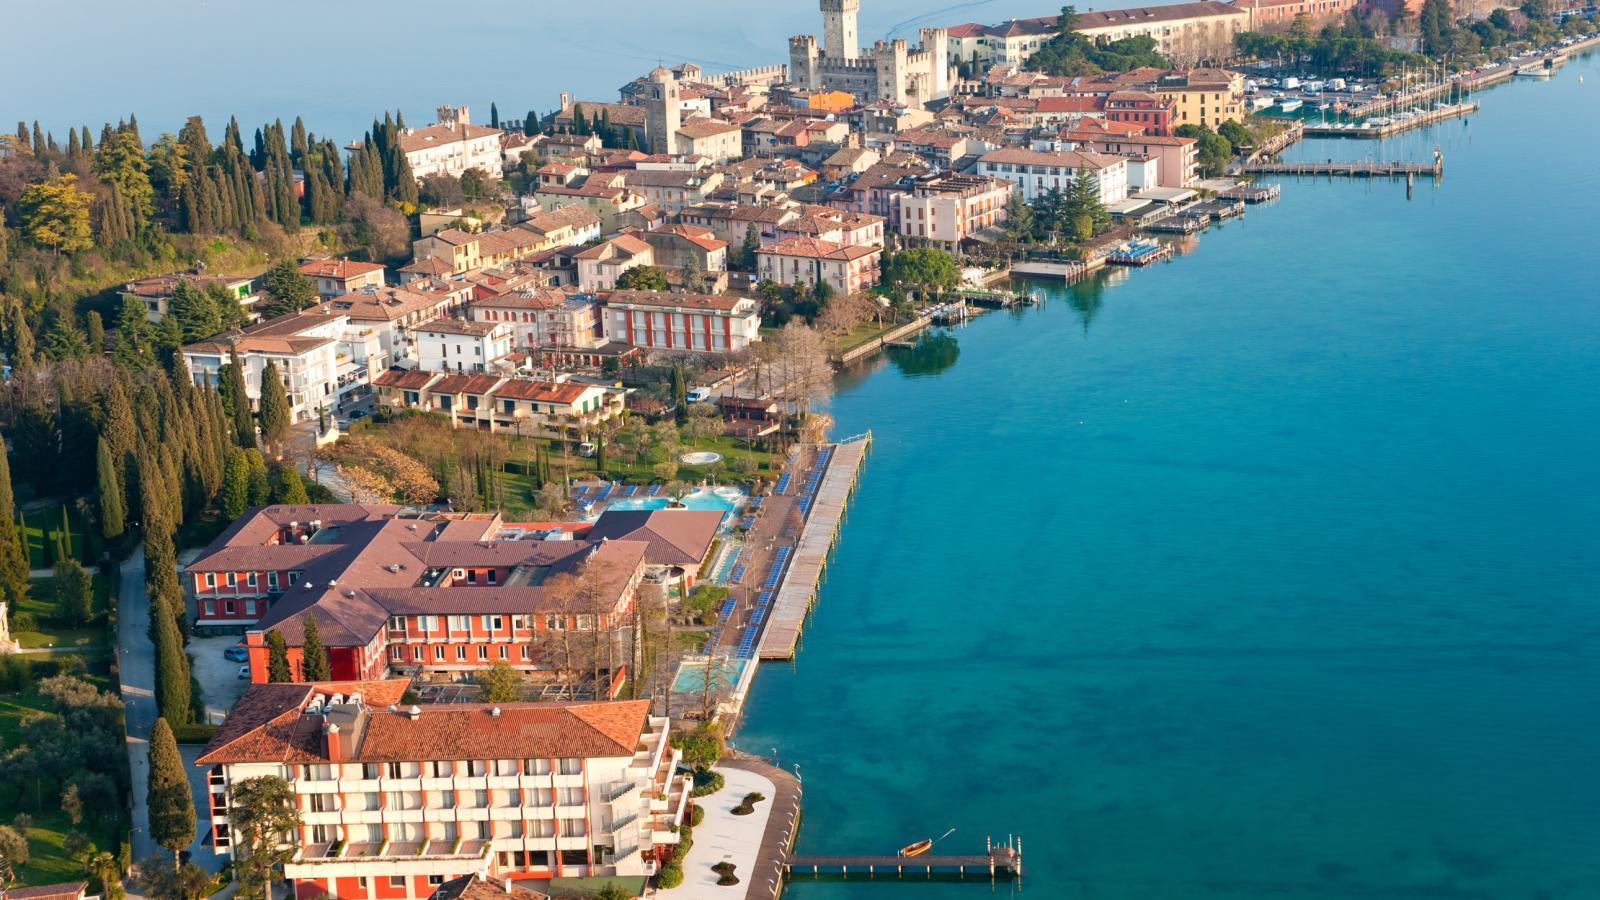 Iseo Lago Hotel Italy